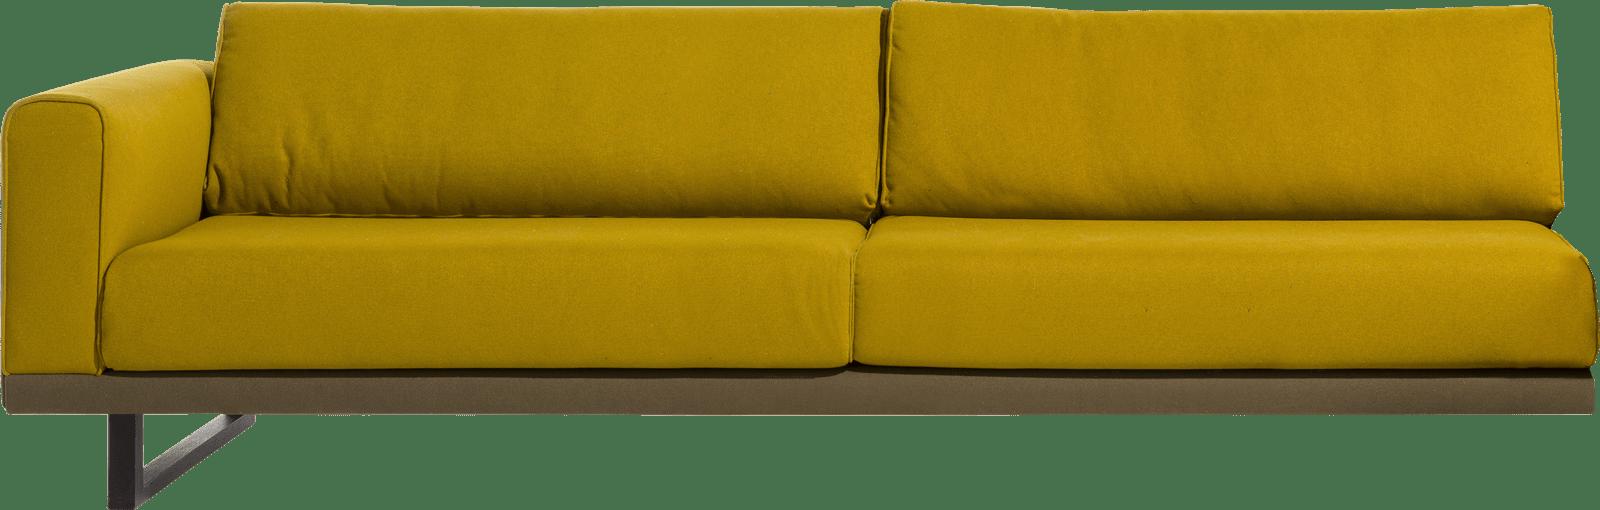 Silves - 3.5-sitzer armlehne links